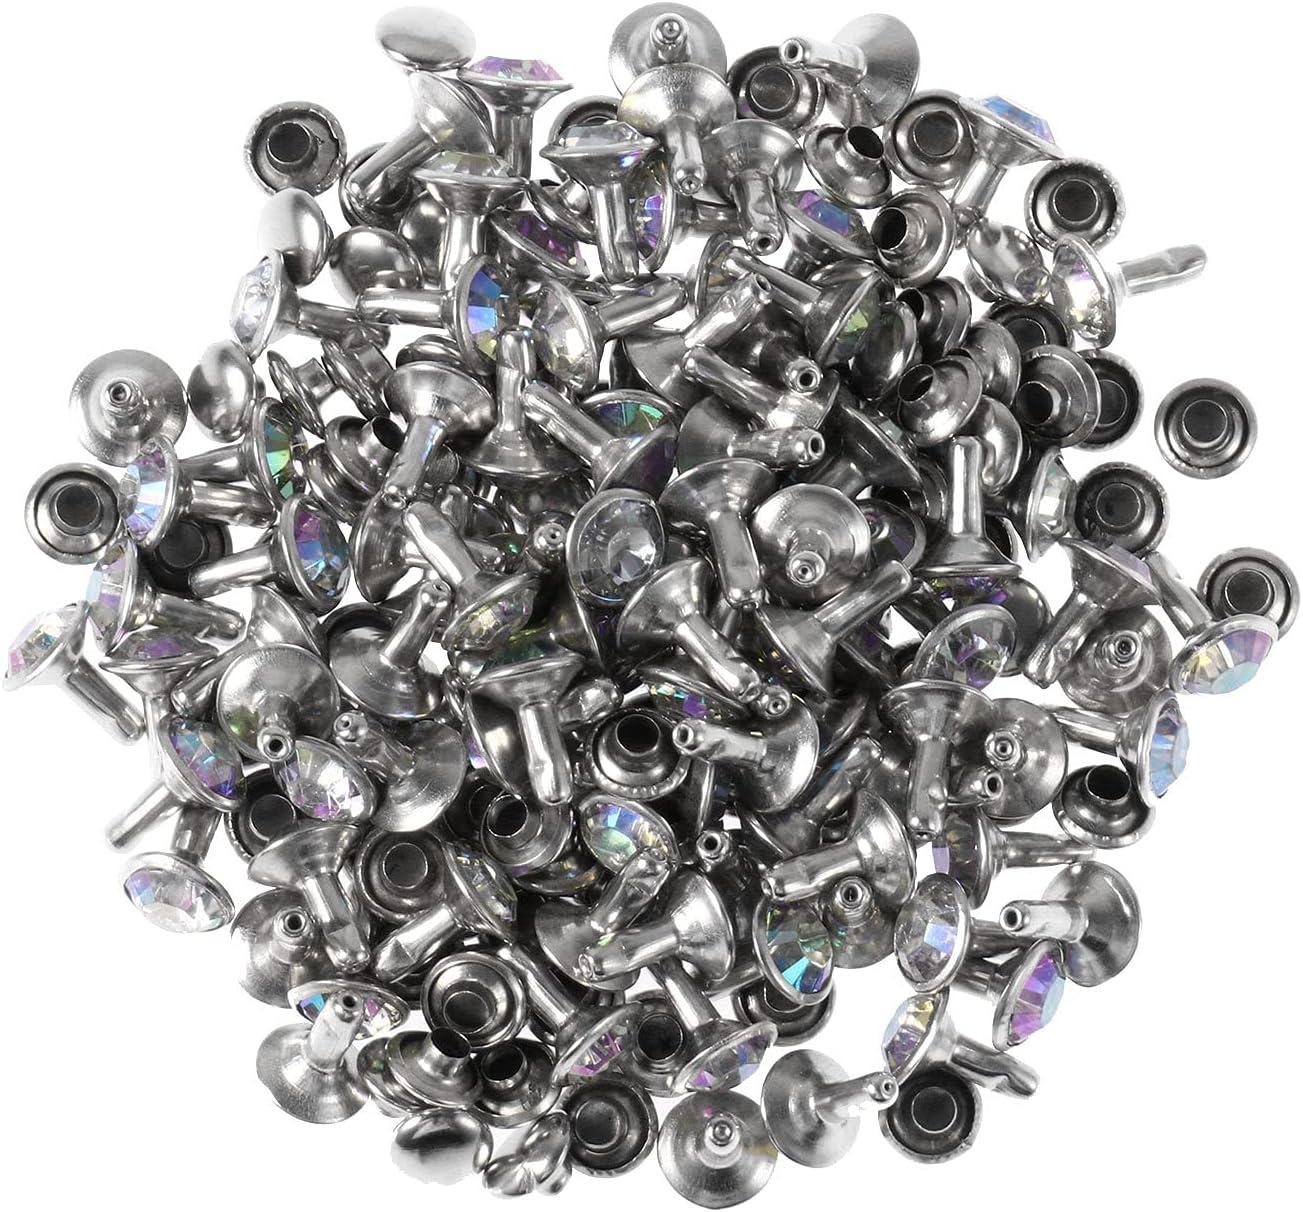 iiniim 100pcs Rhinestone Crystal Max 49% OFF Rivets Barbs Leather High material Copper Cra